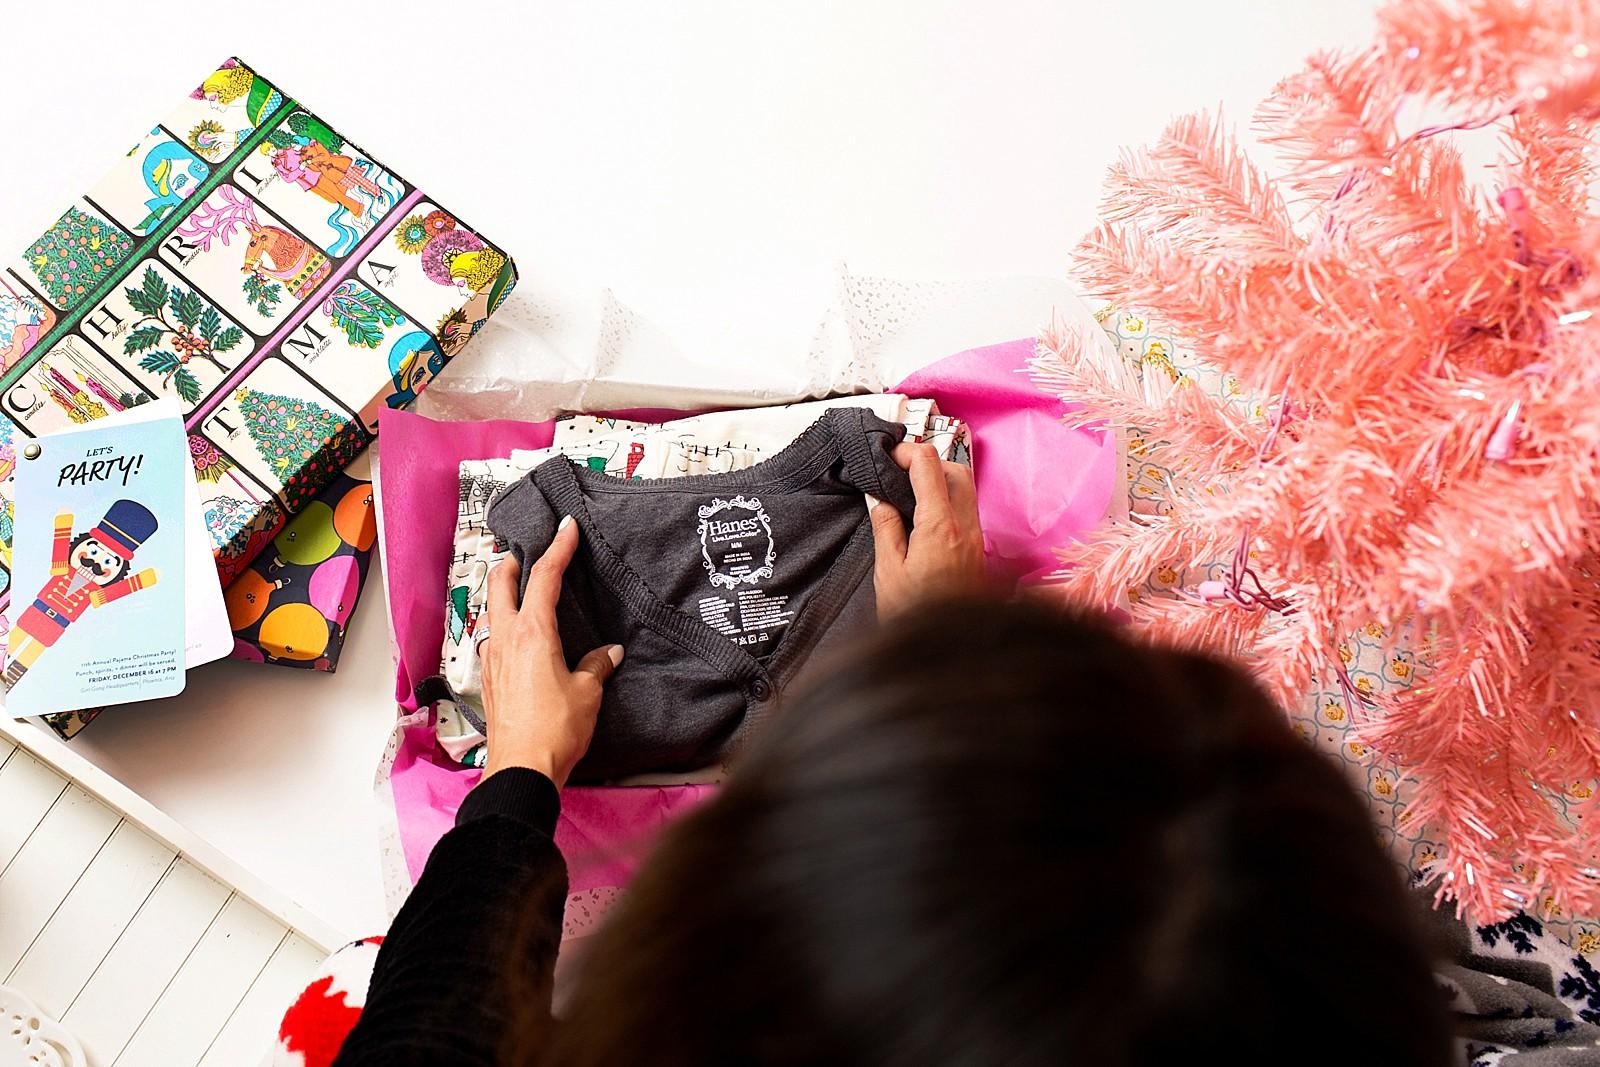 hanes-christmas-pajamas-girls-pajama-party-ideas-cute-jammies-diana-elizabeth-lifestyle-fashion-blogger-phoenix-arizona-1706